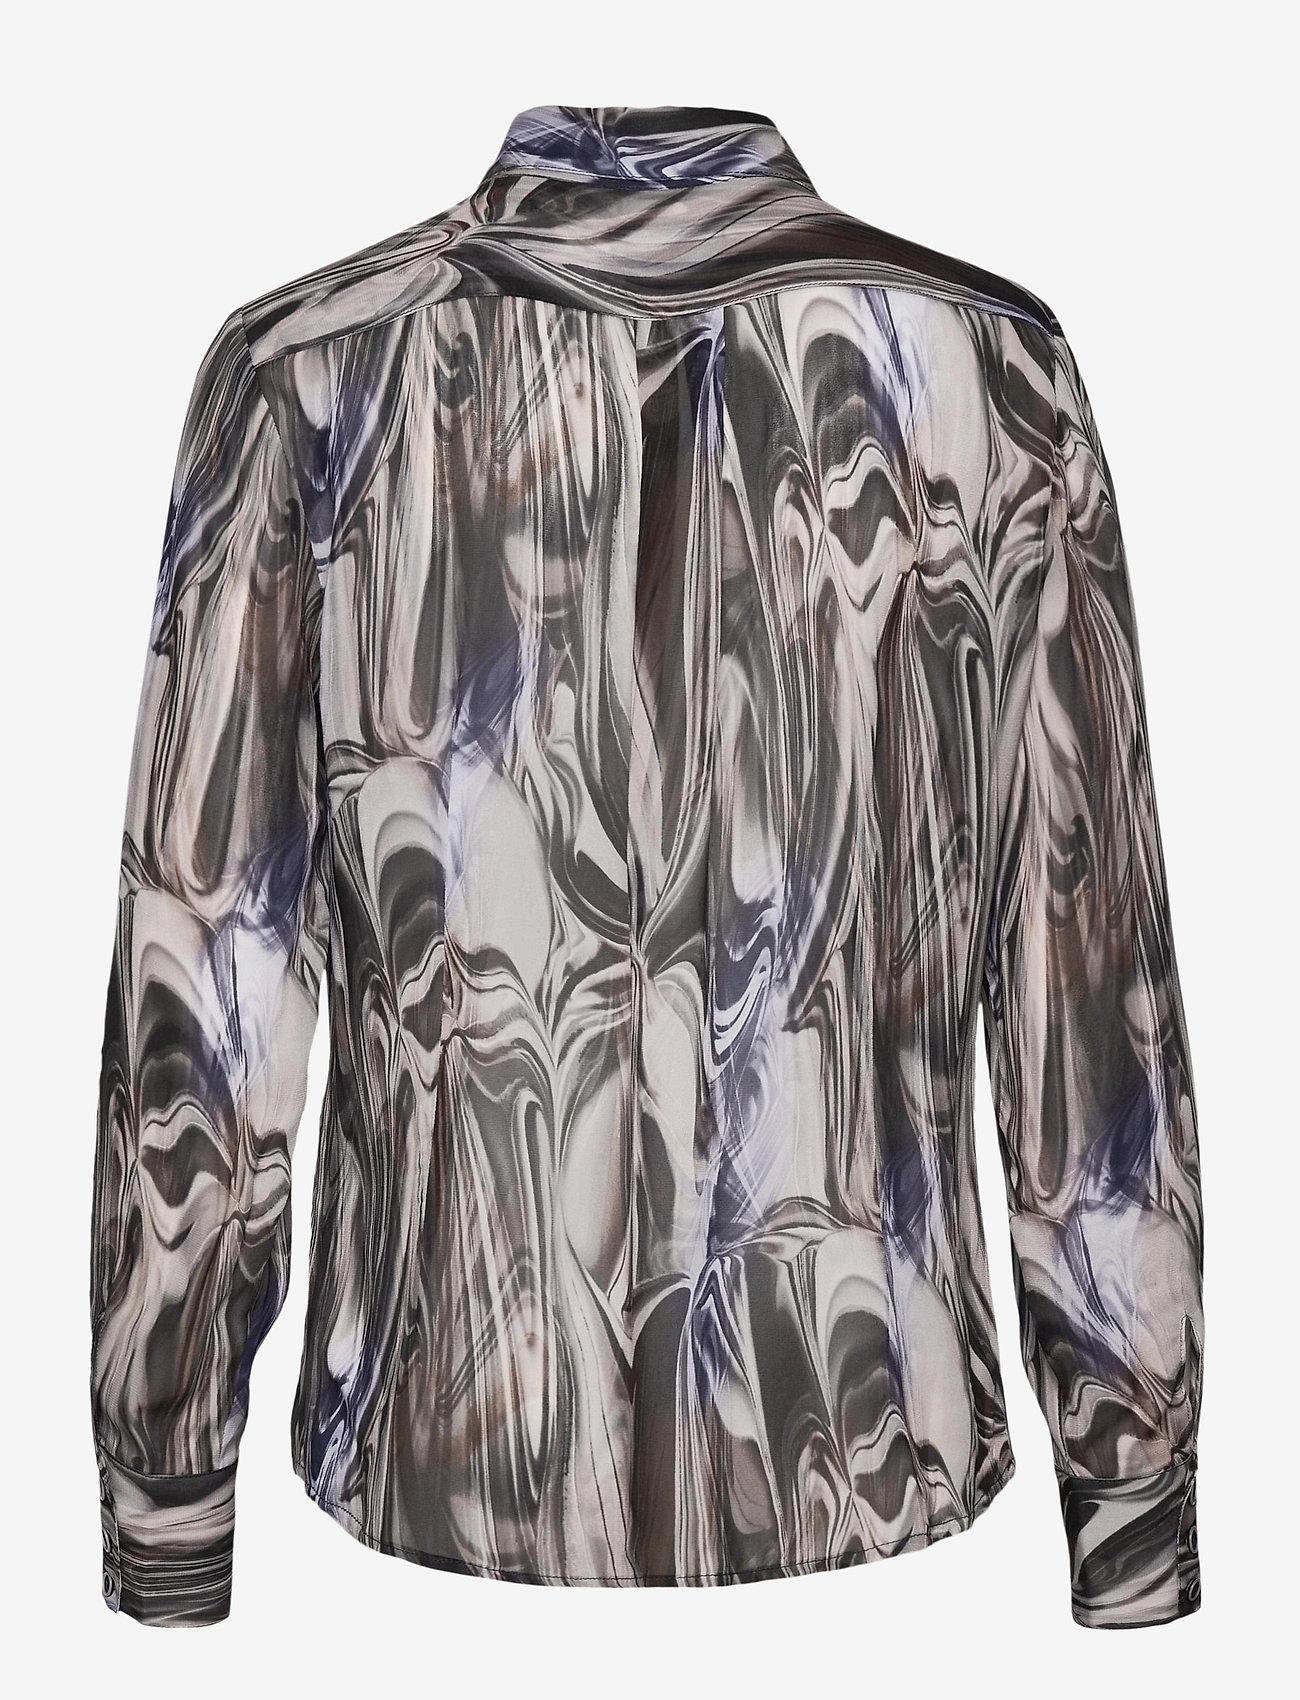 SAND - 3389 - Lotte BC - overhemden met lange mouwen - blue - 1